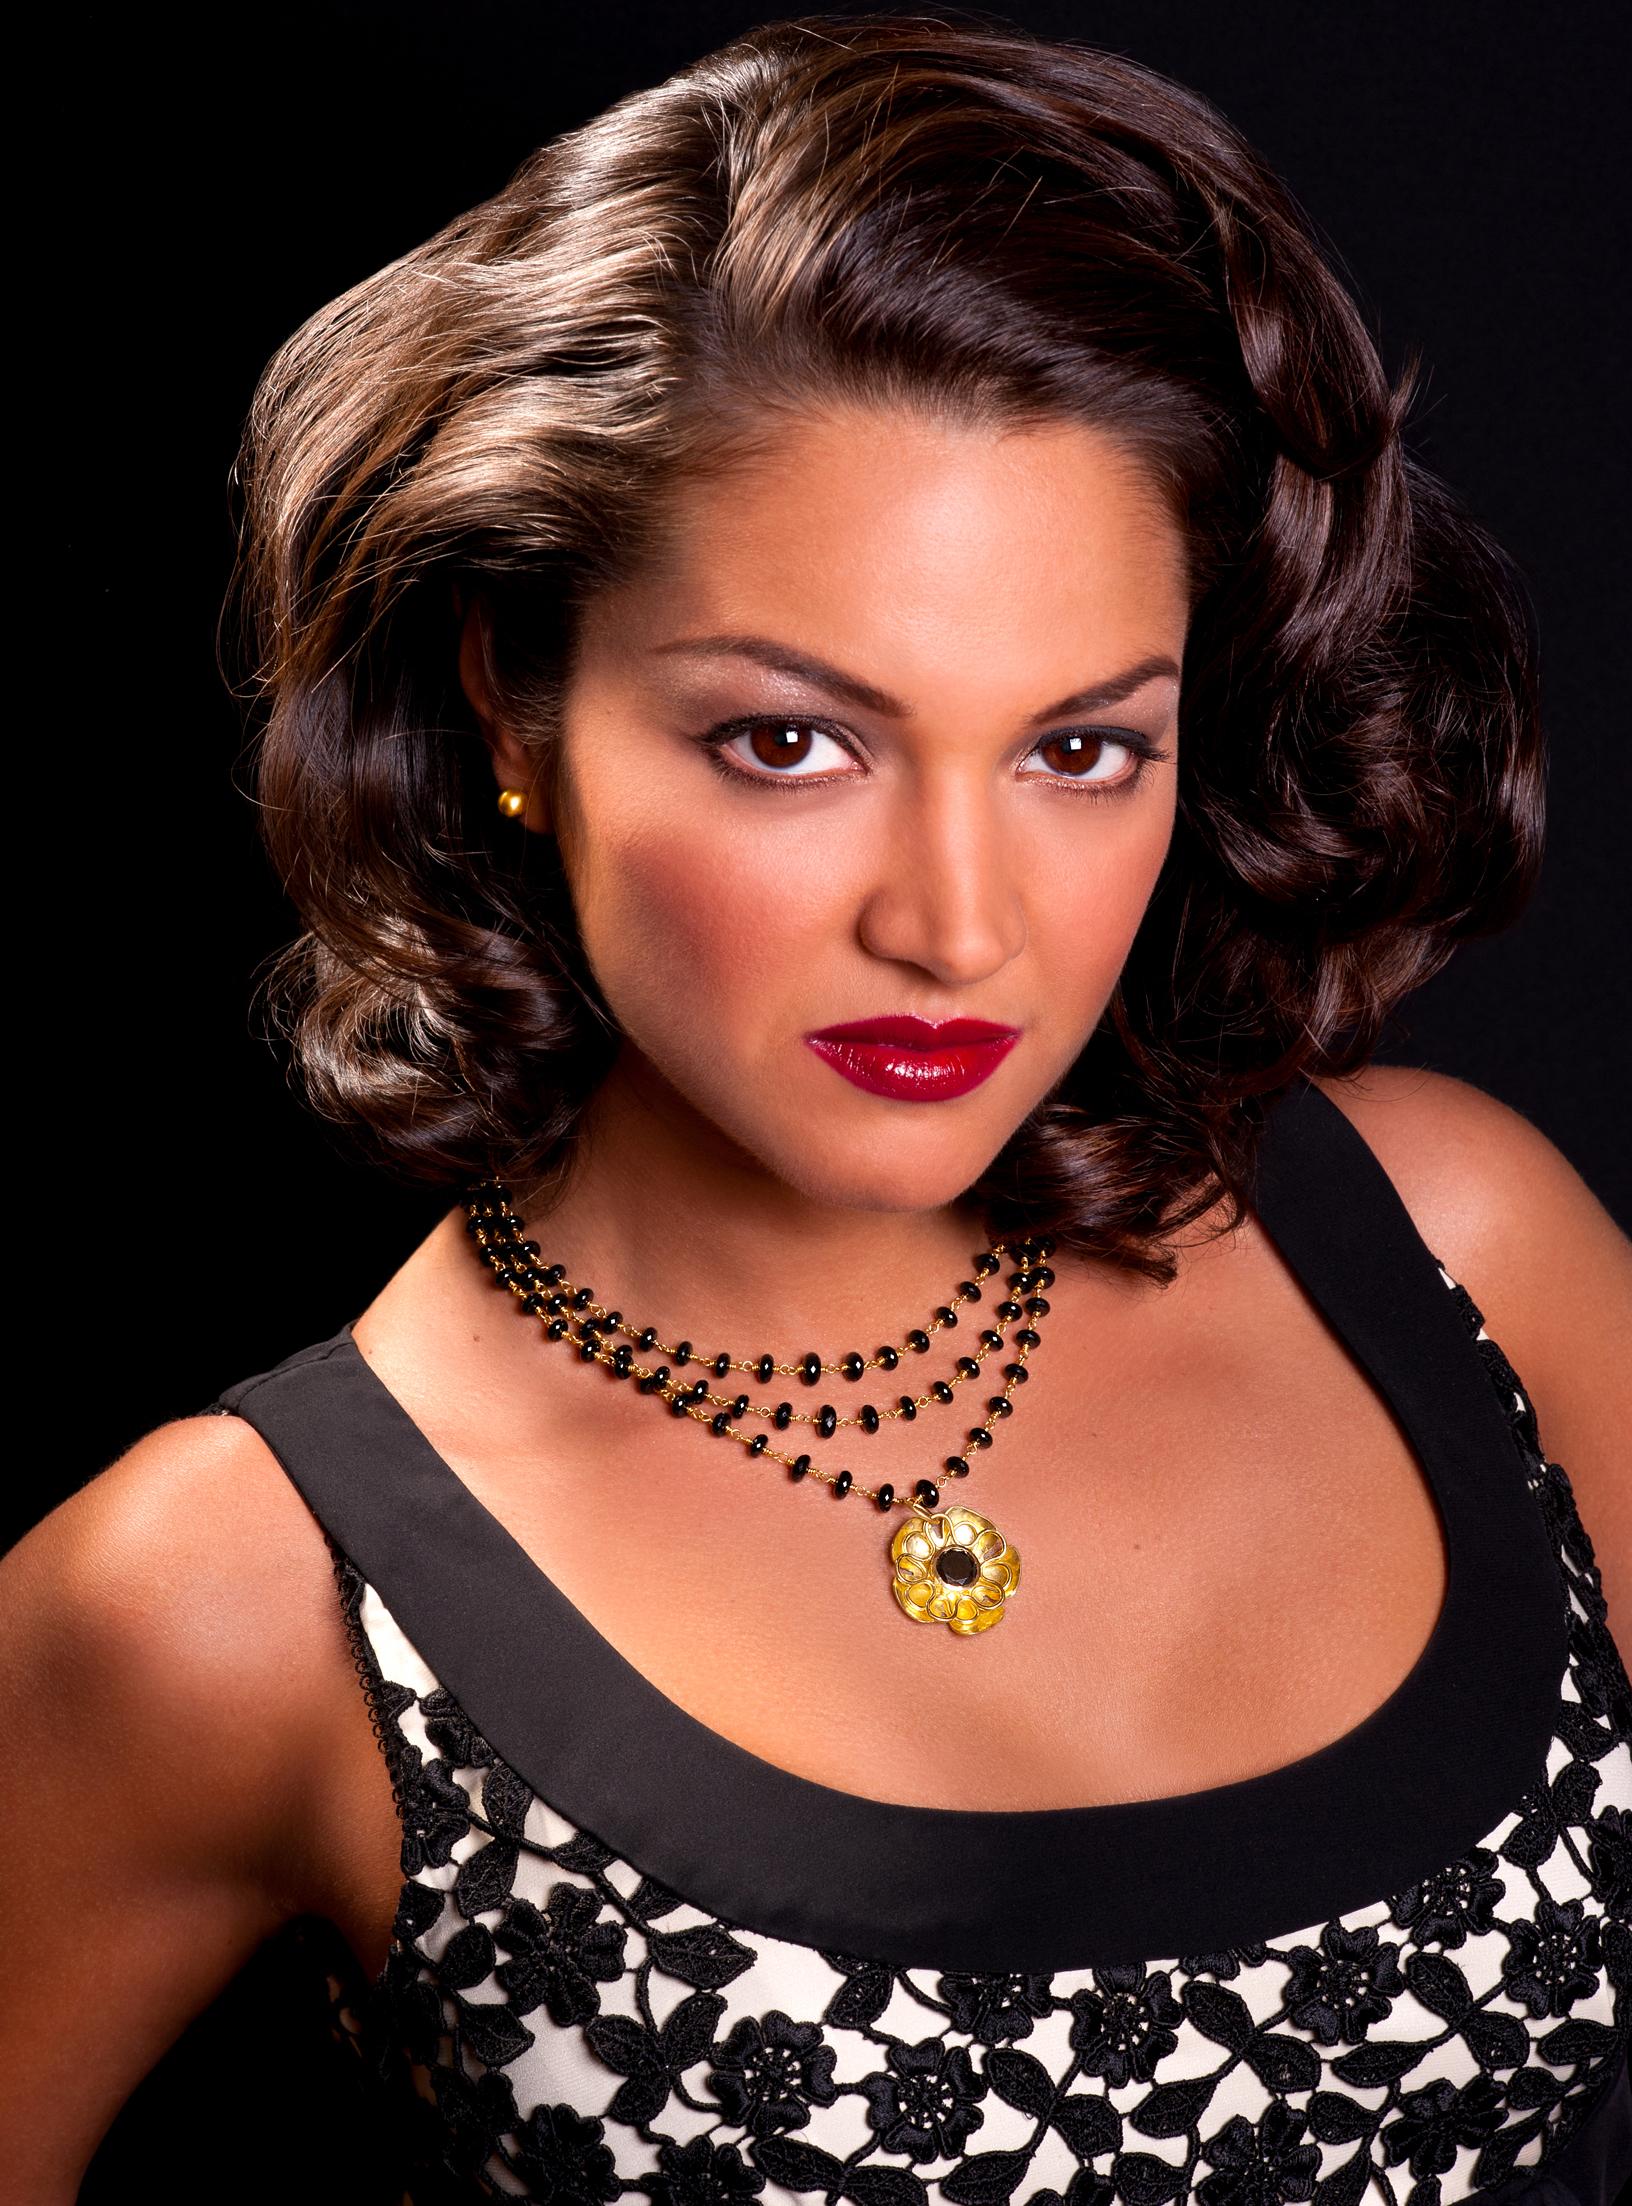 Paula in black diamond necklace.jpg